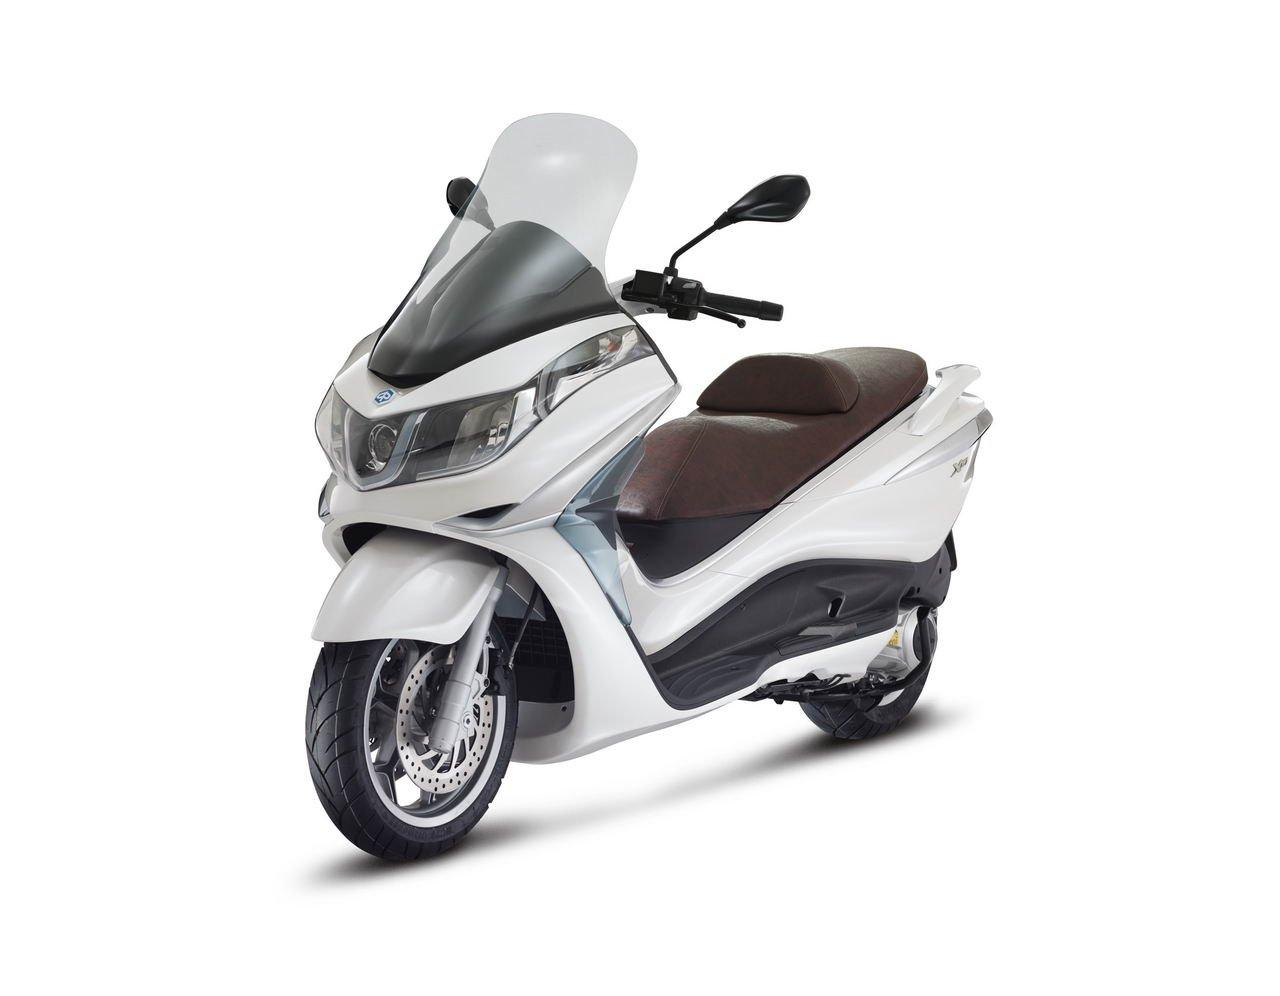 Listino Piaggio Liberty 50 2T Teens Scooter 50 - image 15139_piaggio-x10-125 on http://moto.motori.net